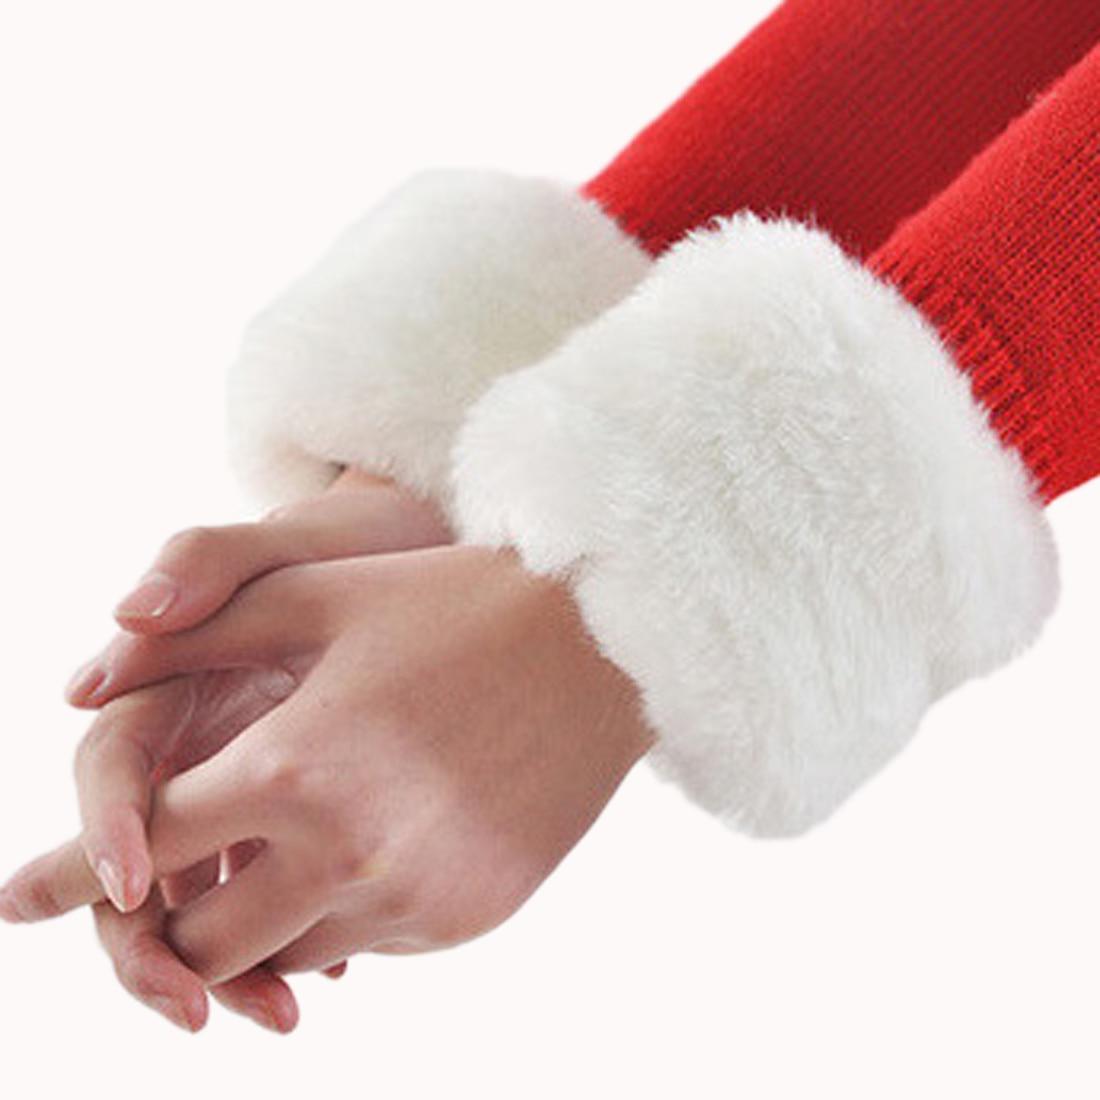 1 Pair Faux Fur Wrist Slap Women Fashion Winter Elastic Wrist Slap On Cuffs Ladies Solid Color Arm Warmer Plush Wrist Protector